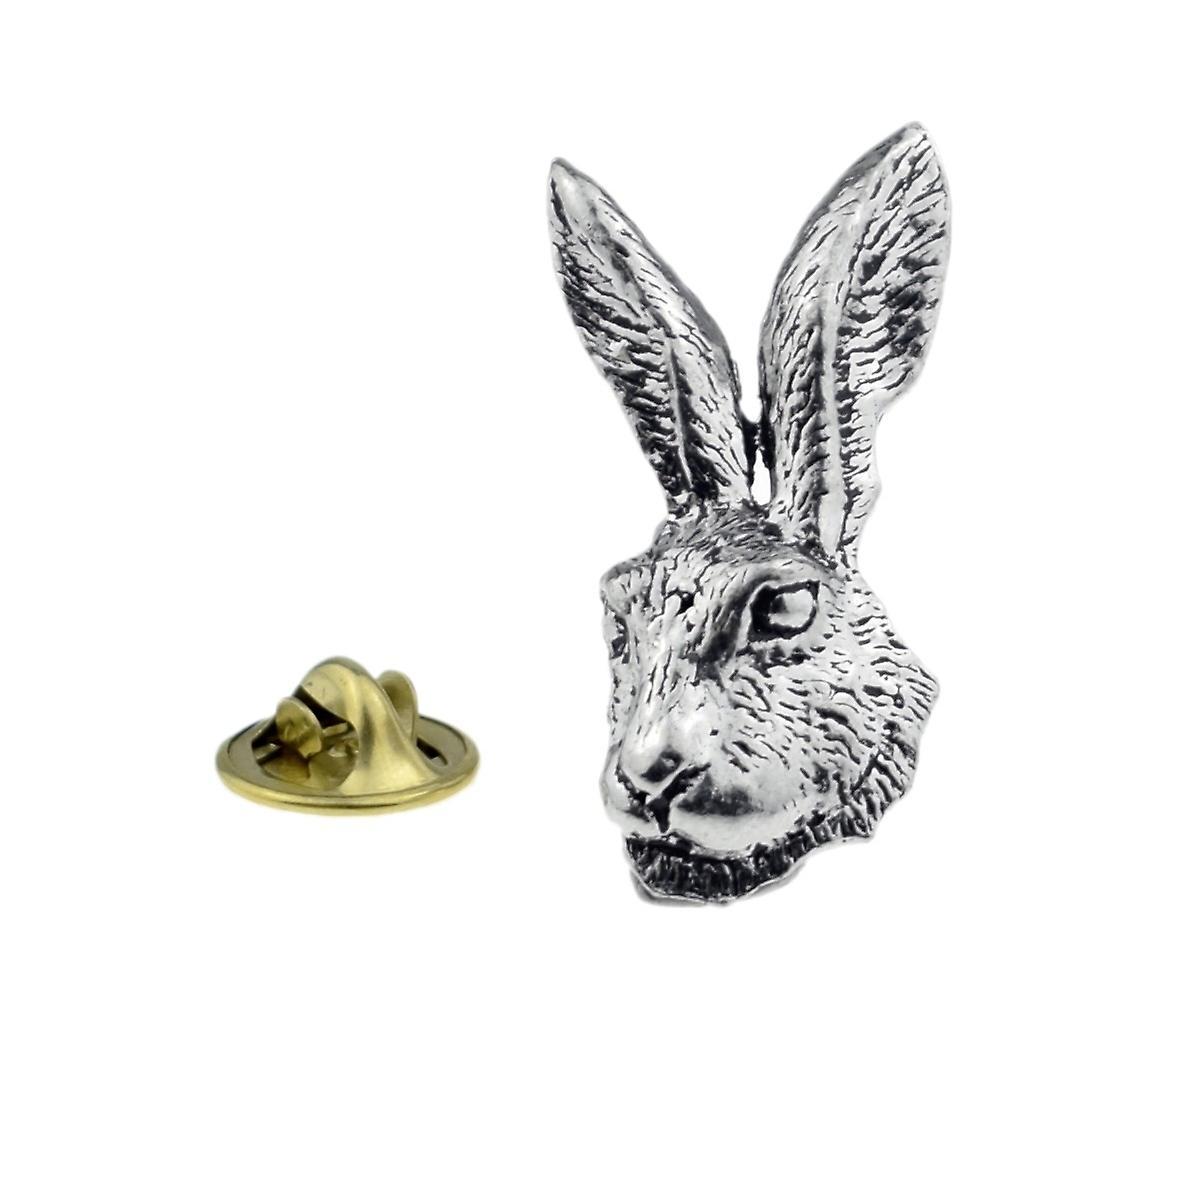 Hare Head Pewter Lapel Pin Badge, Rabbit